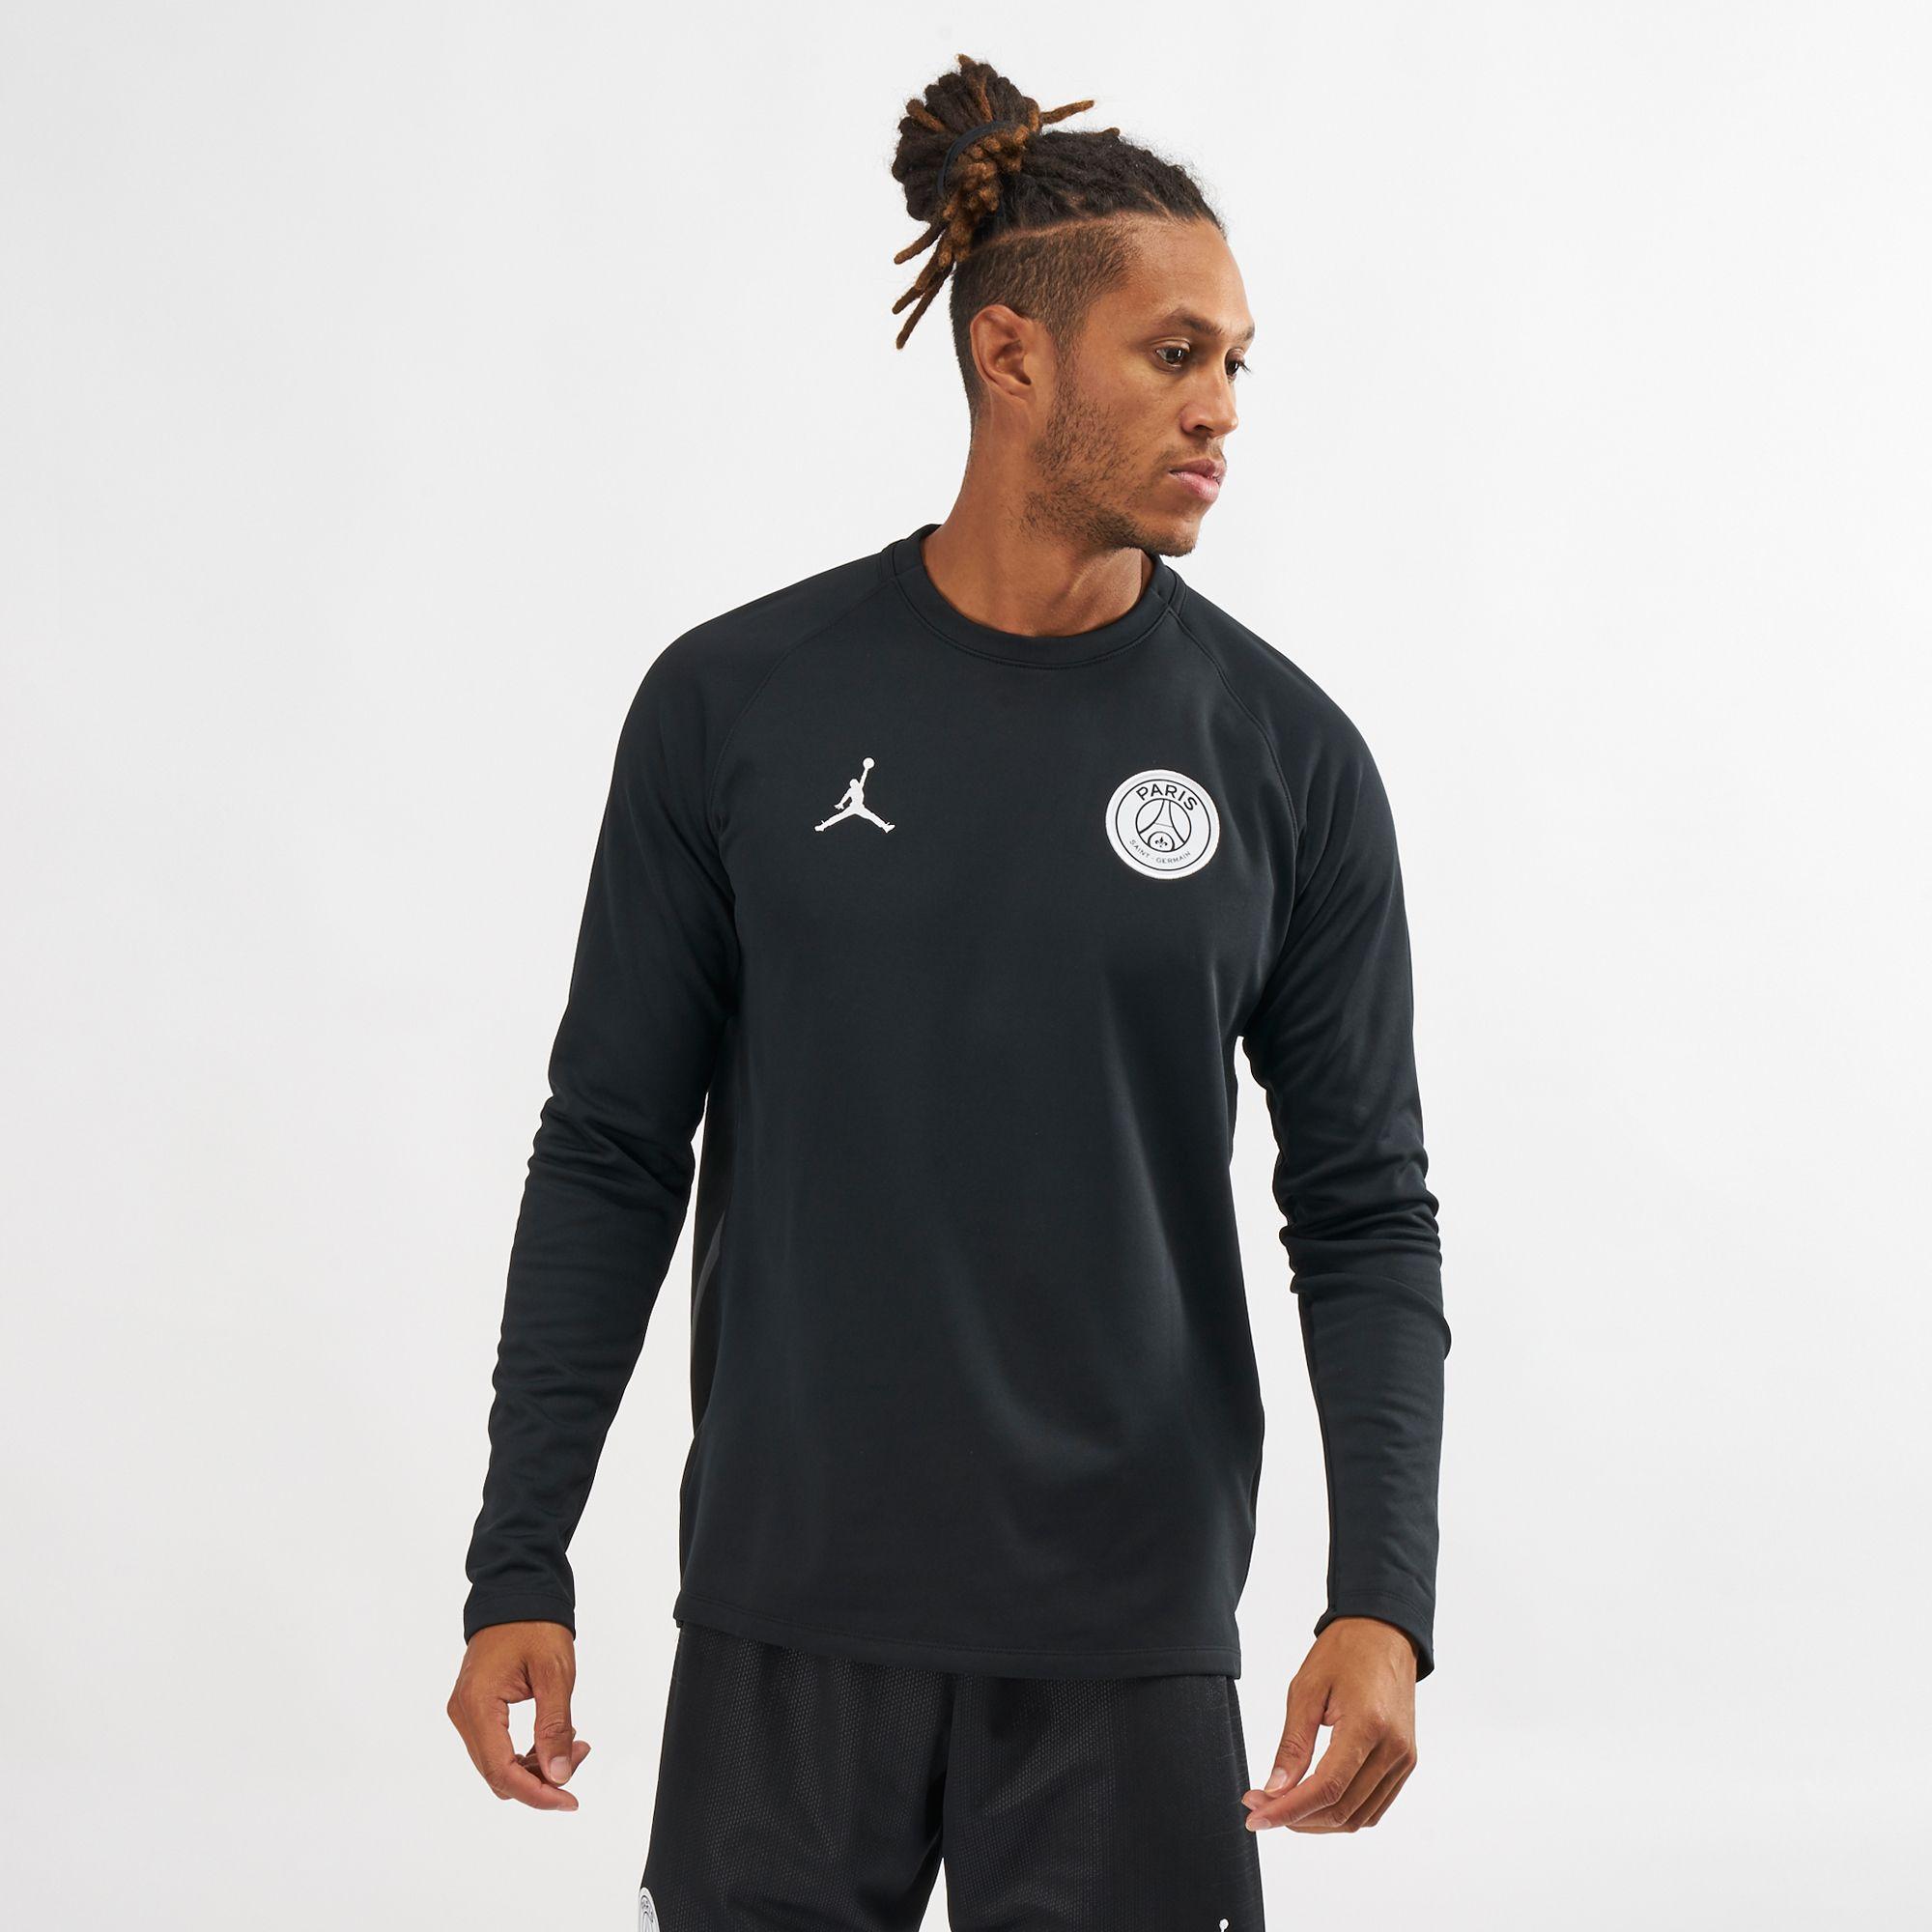 5fb0e495 Nike Dry Squad Paris Saint-Germain Long Sleeve T-Shirt   T-Shirts ...